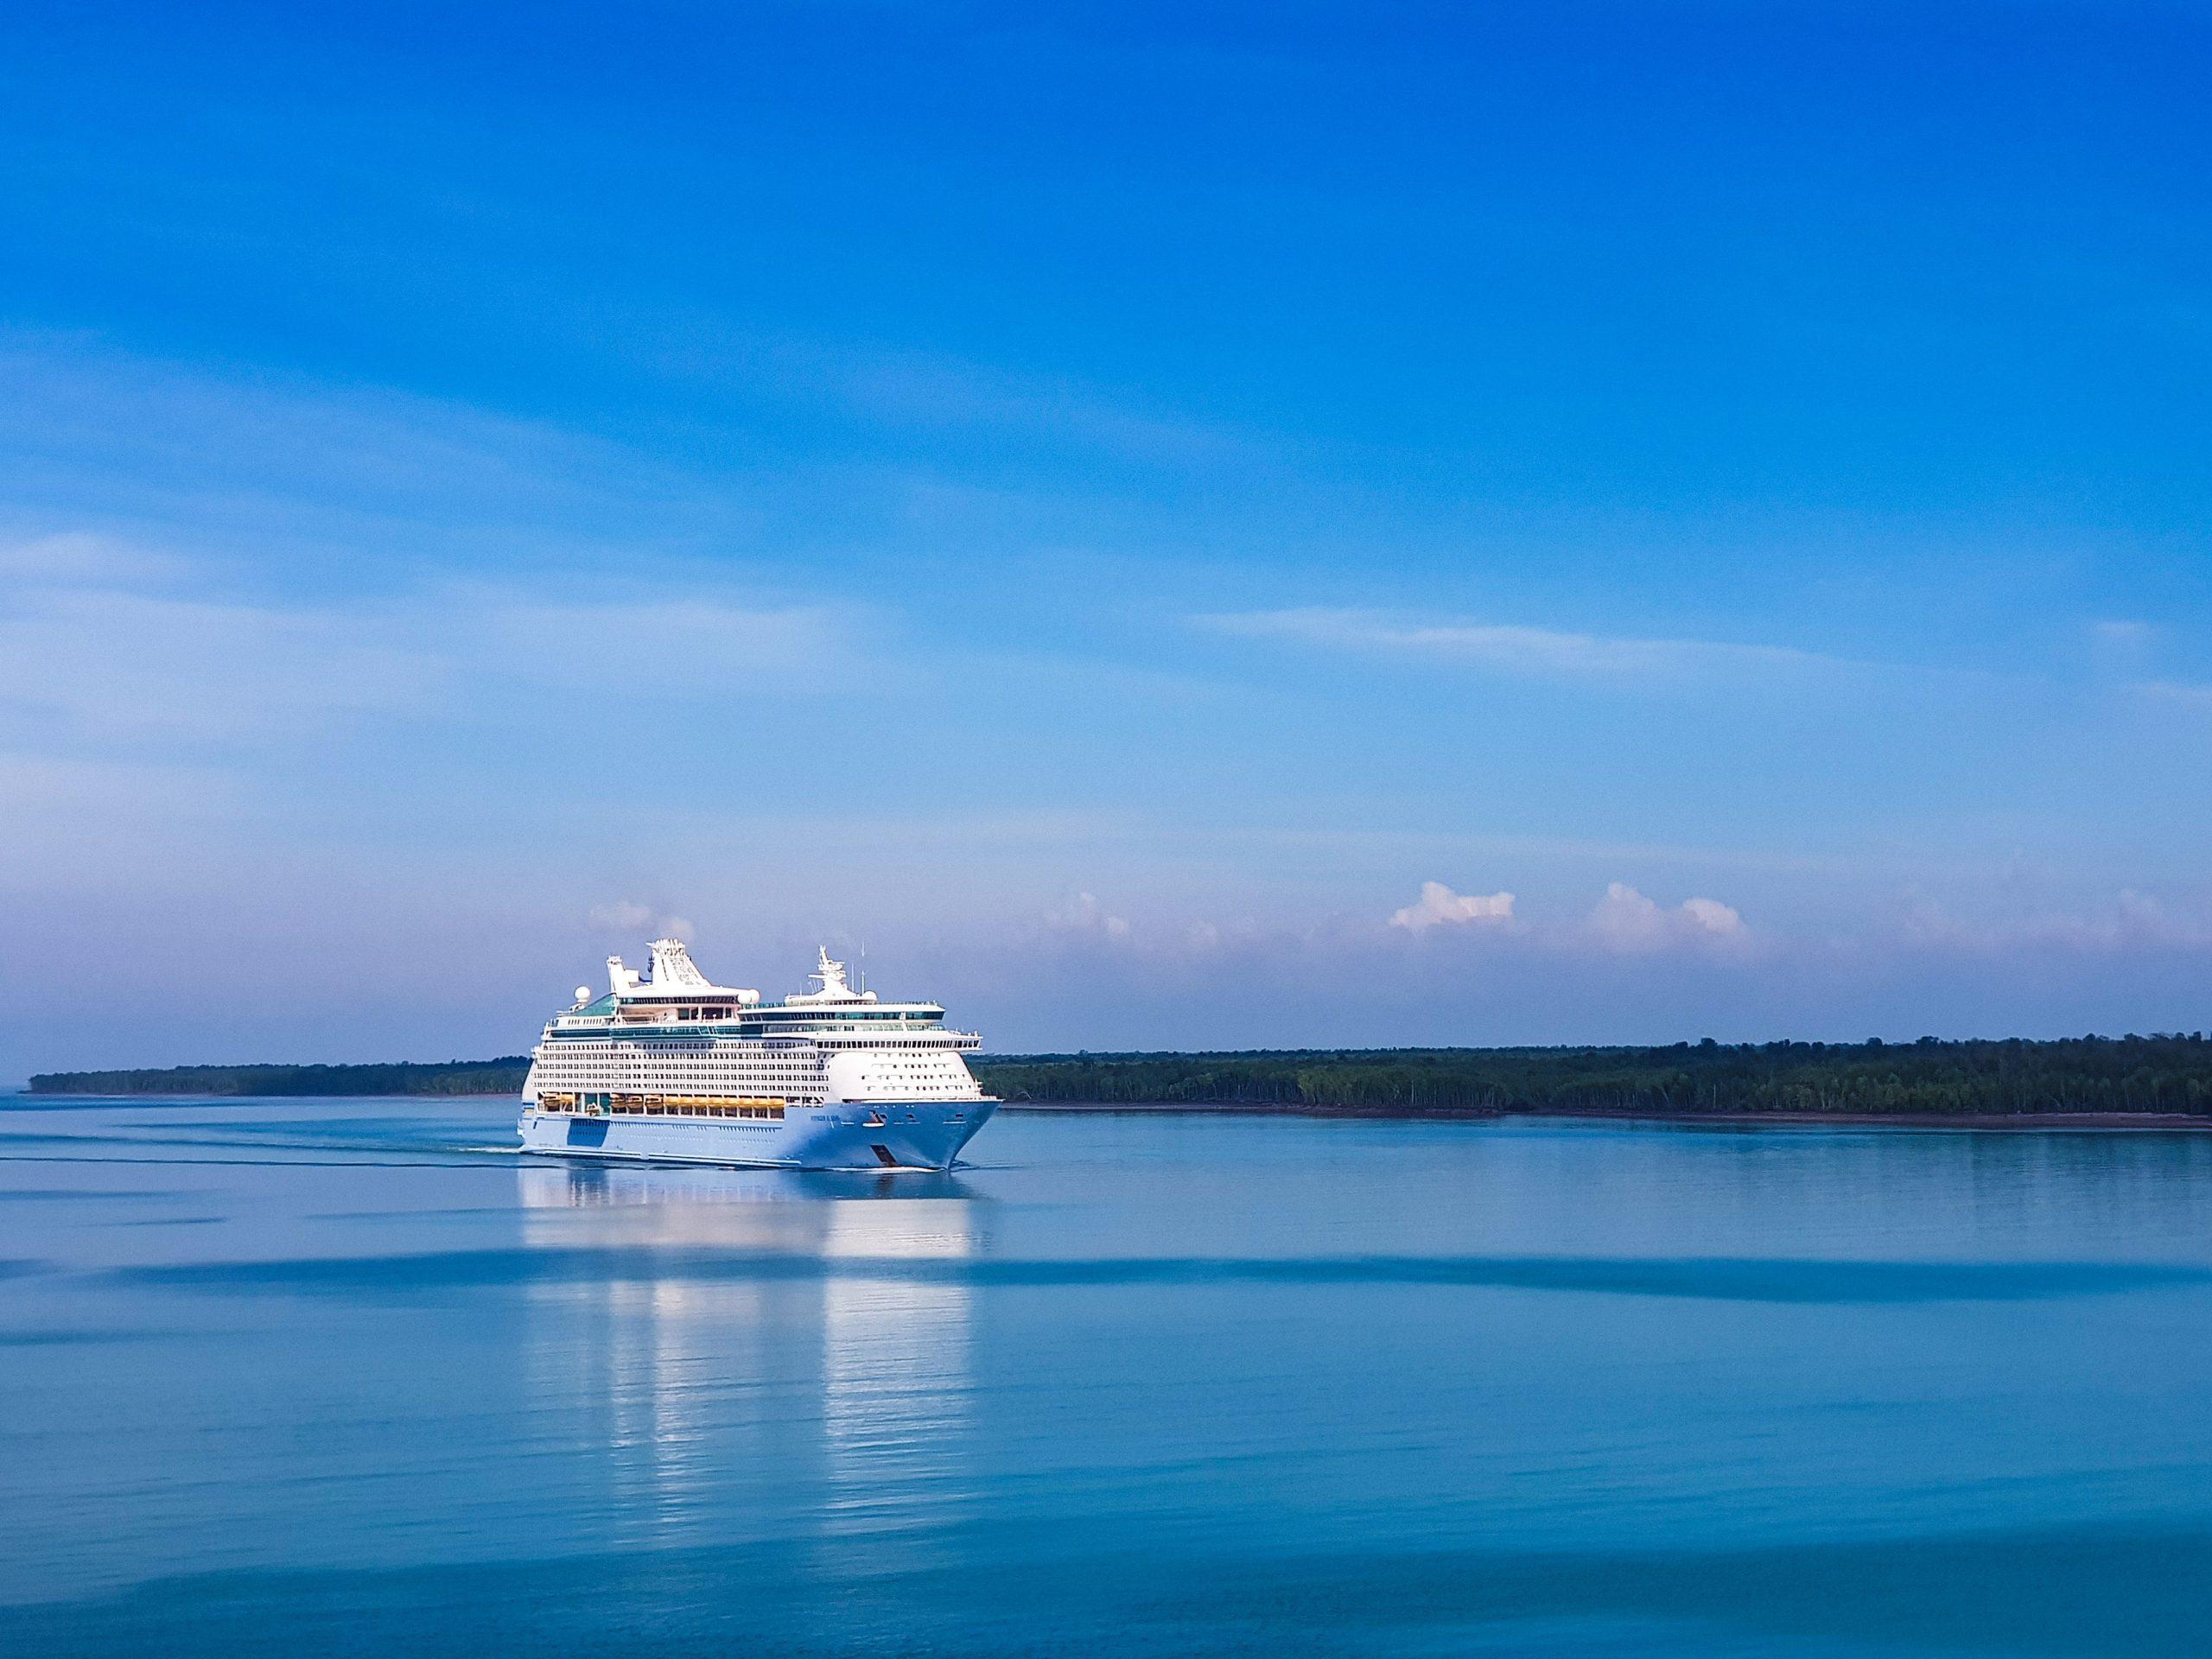 Royal Caribbean Announces World's Longest Cruise Trip To 150 Destinations